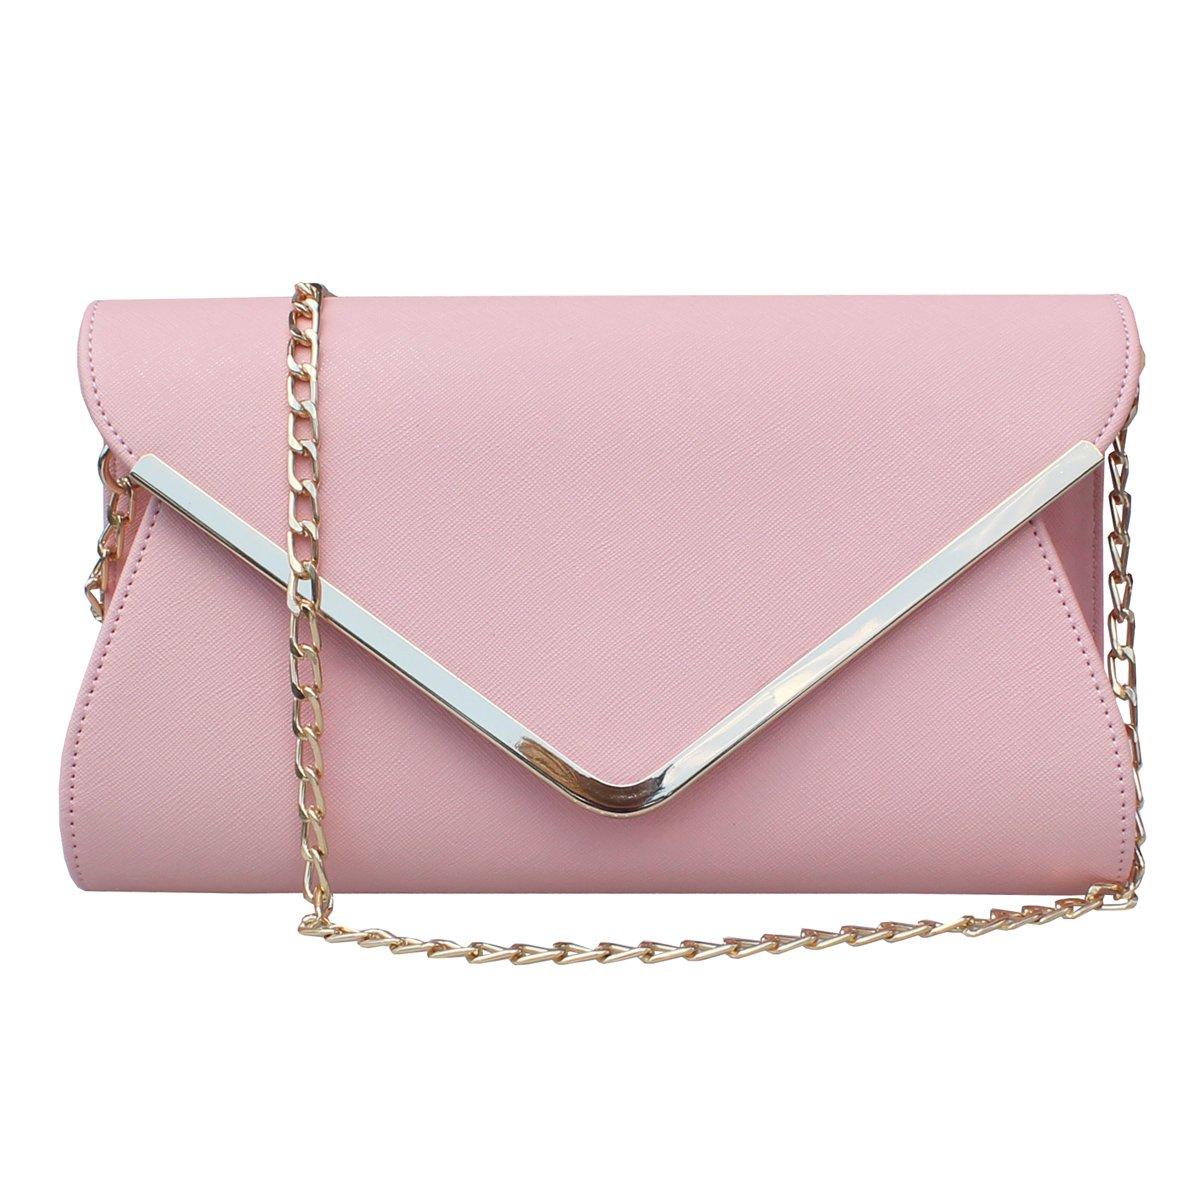 Womens Faux Leather Envelope Clutch Bag Evening Handbag Shouder Bag Wristlet Purse With Chain Strap. (Pink)